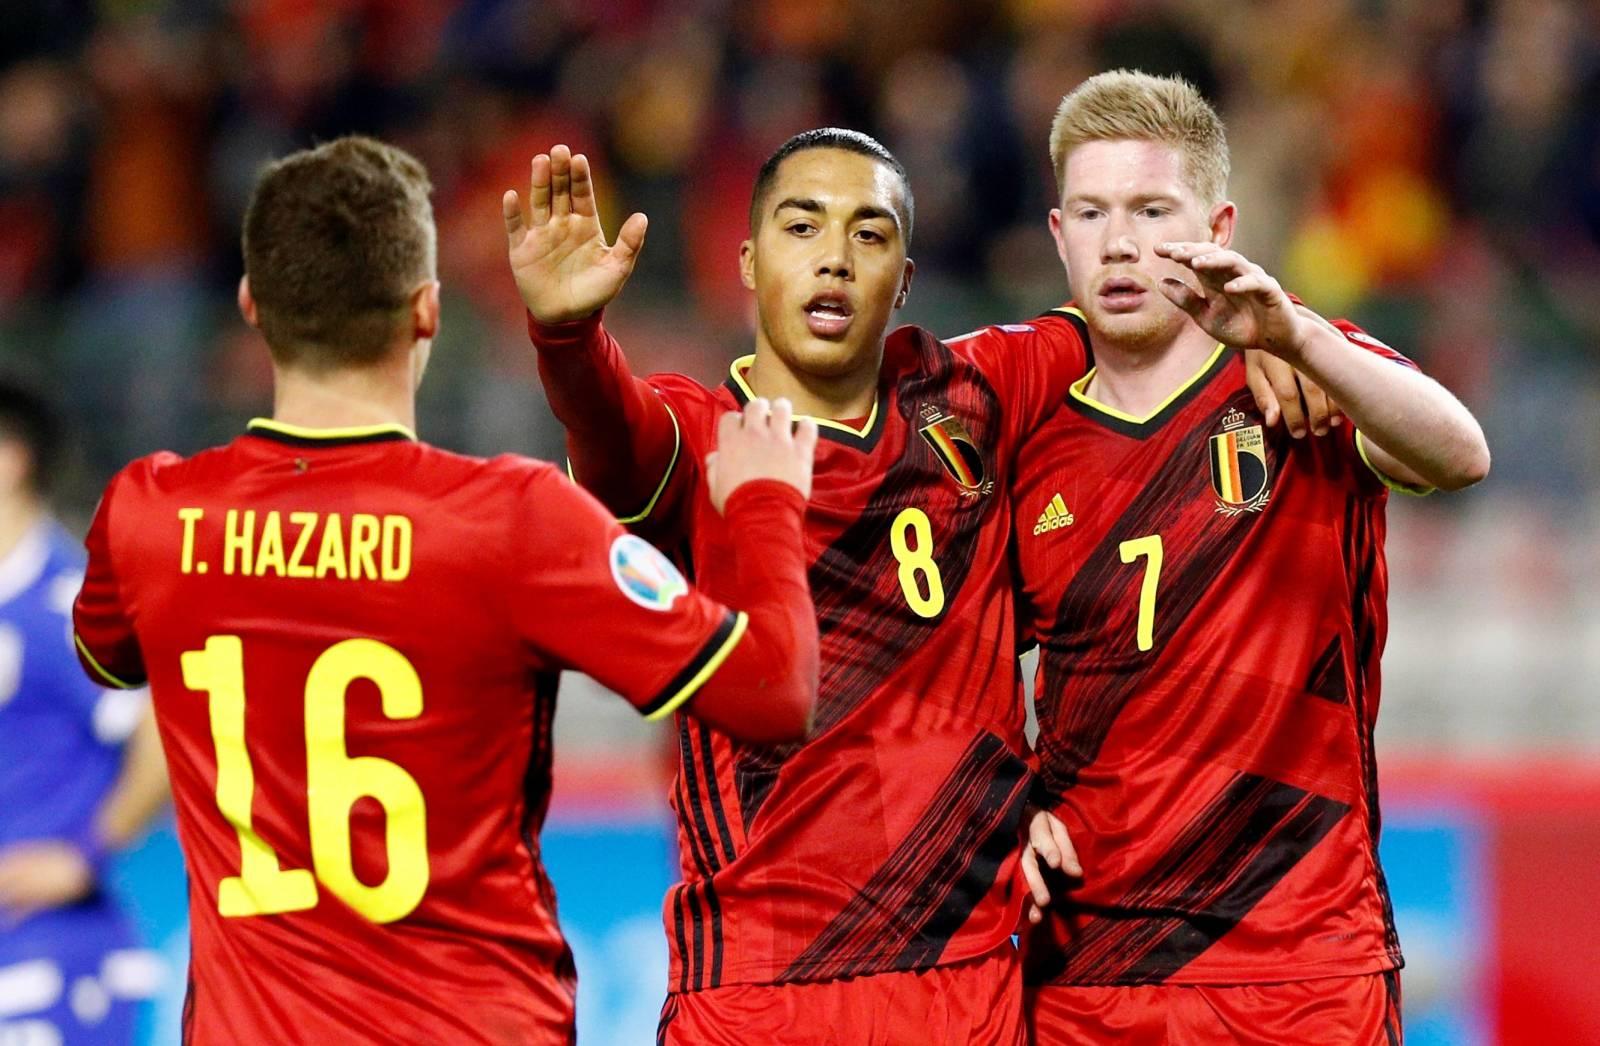 Euro 2020 Qualifier - Group I - Belgium v Cyprus